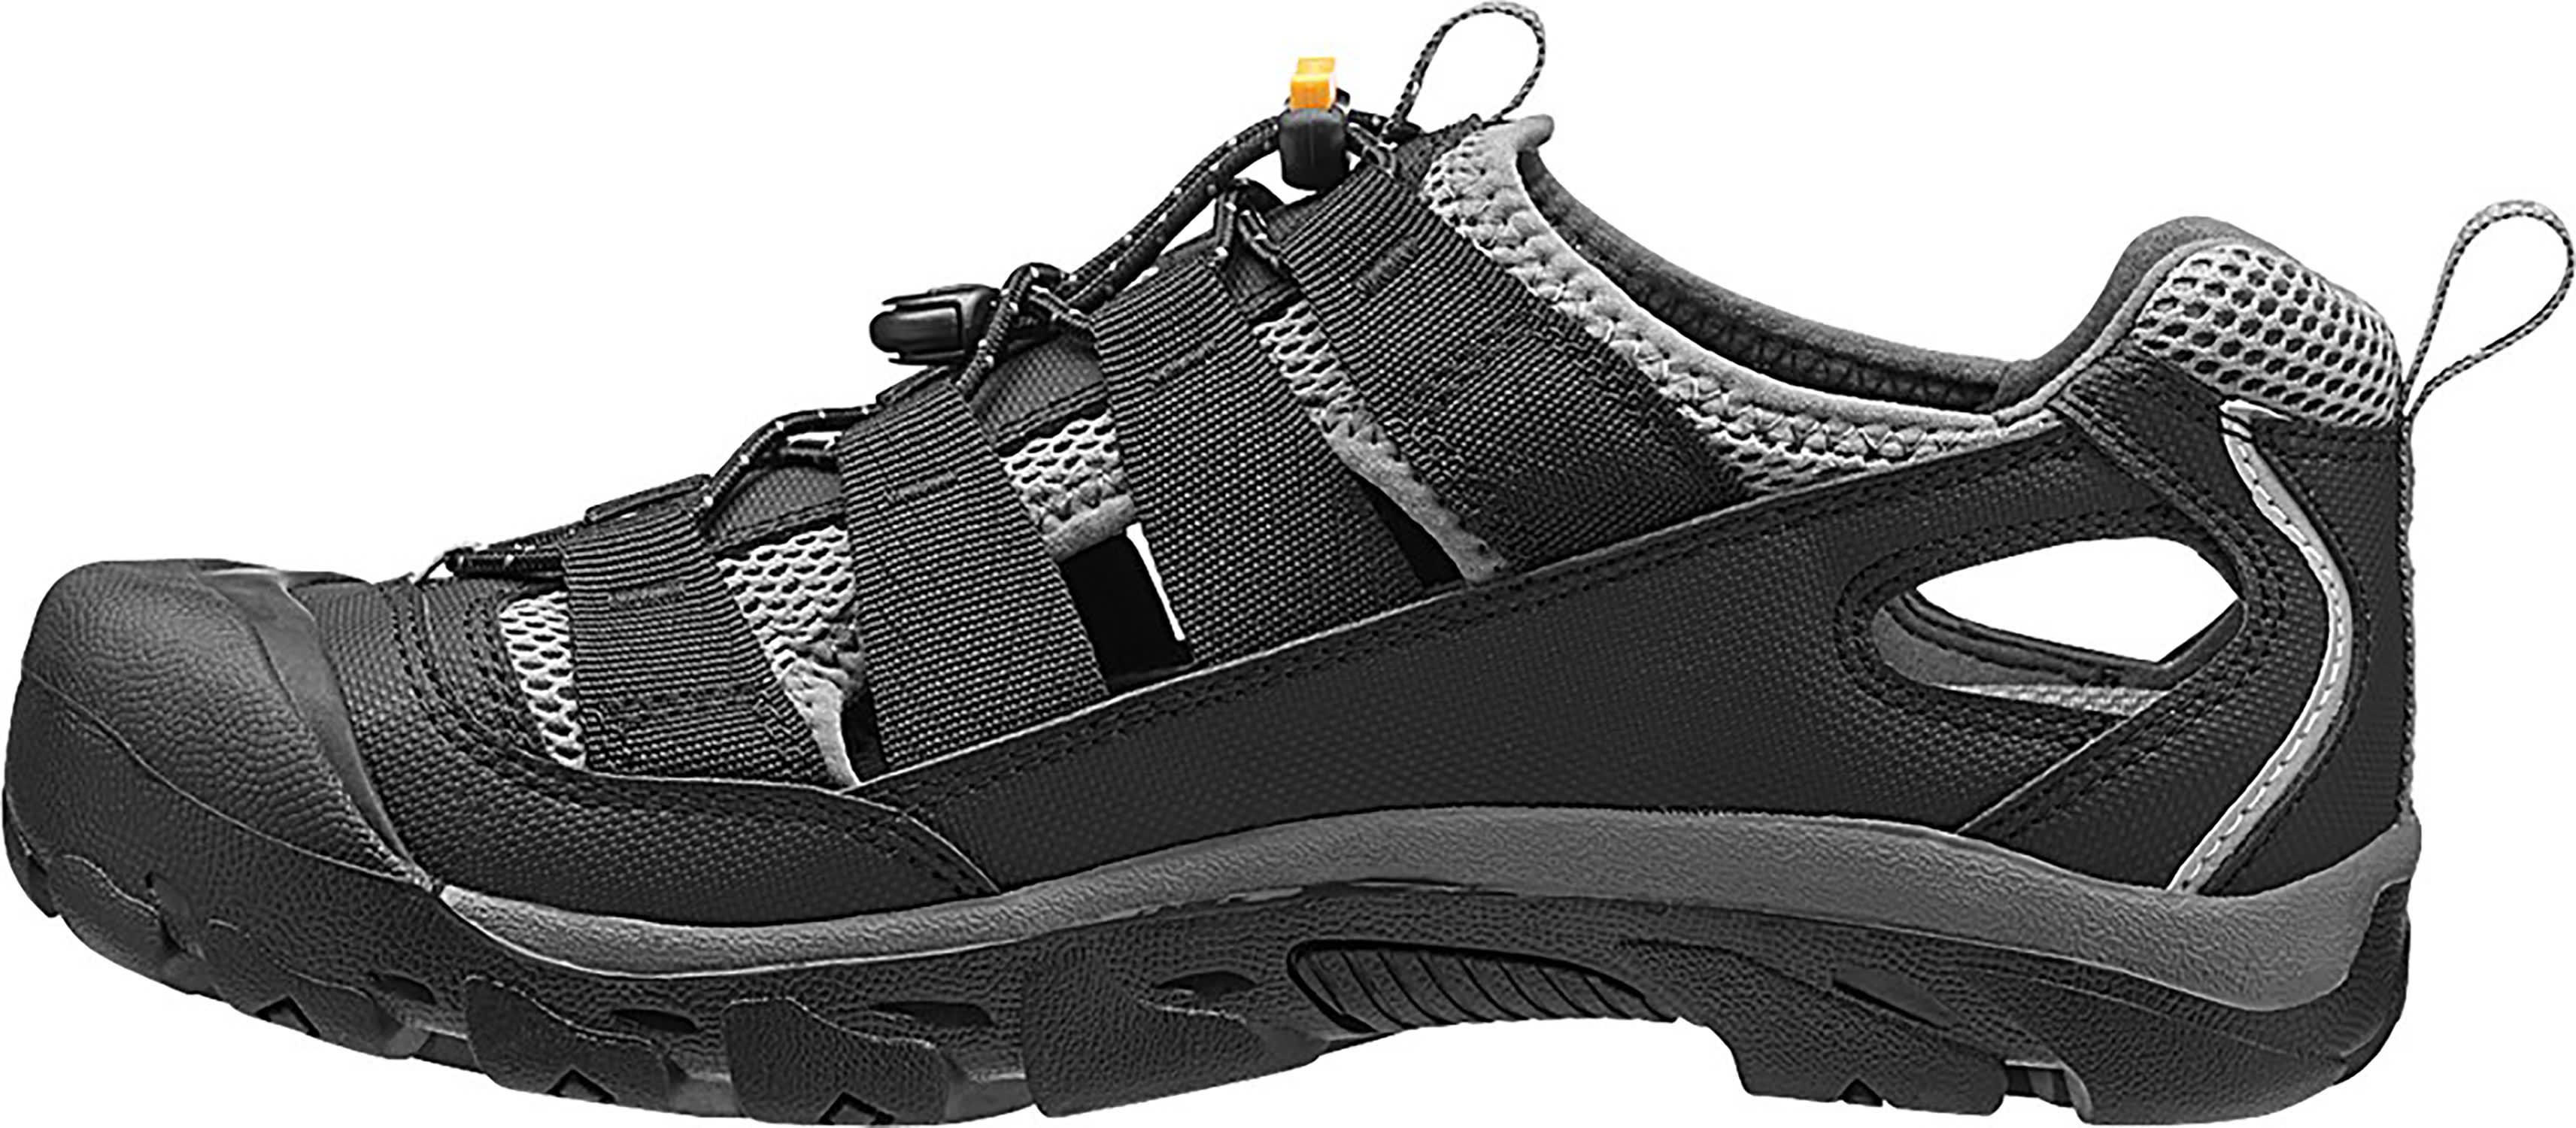 b2f48eb42841 Keen Commuter 4 Bike Shoes - thumbnail 3